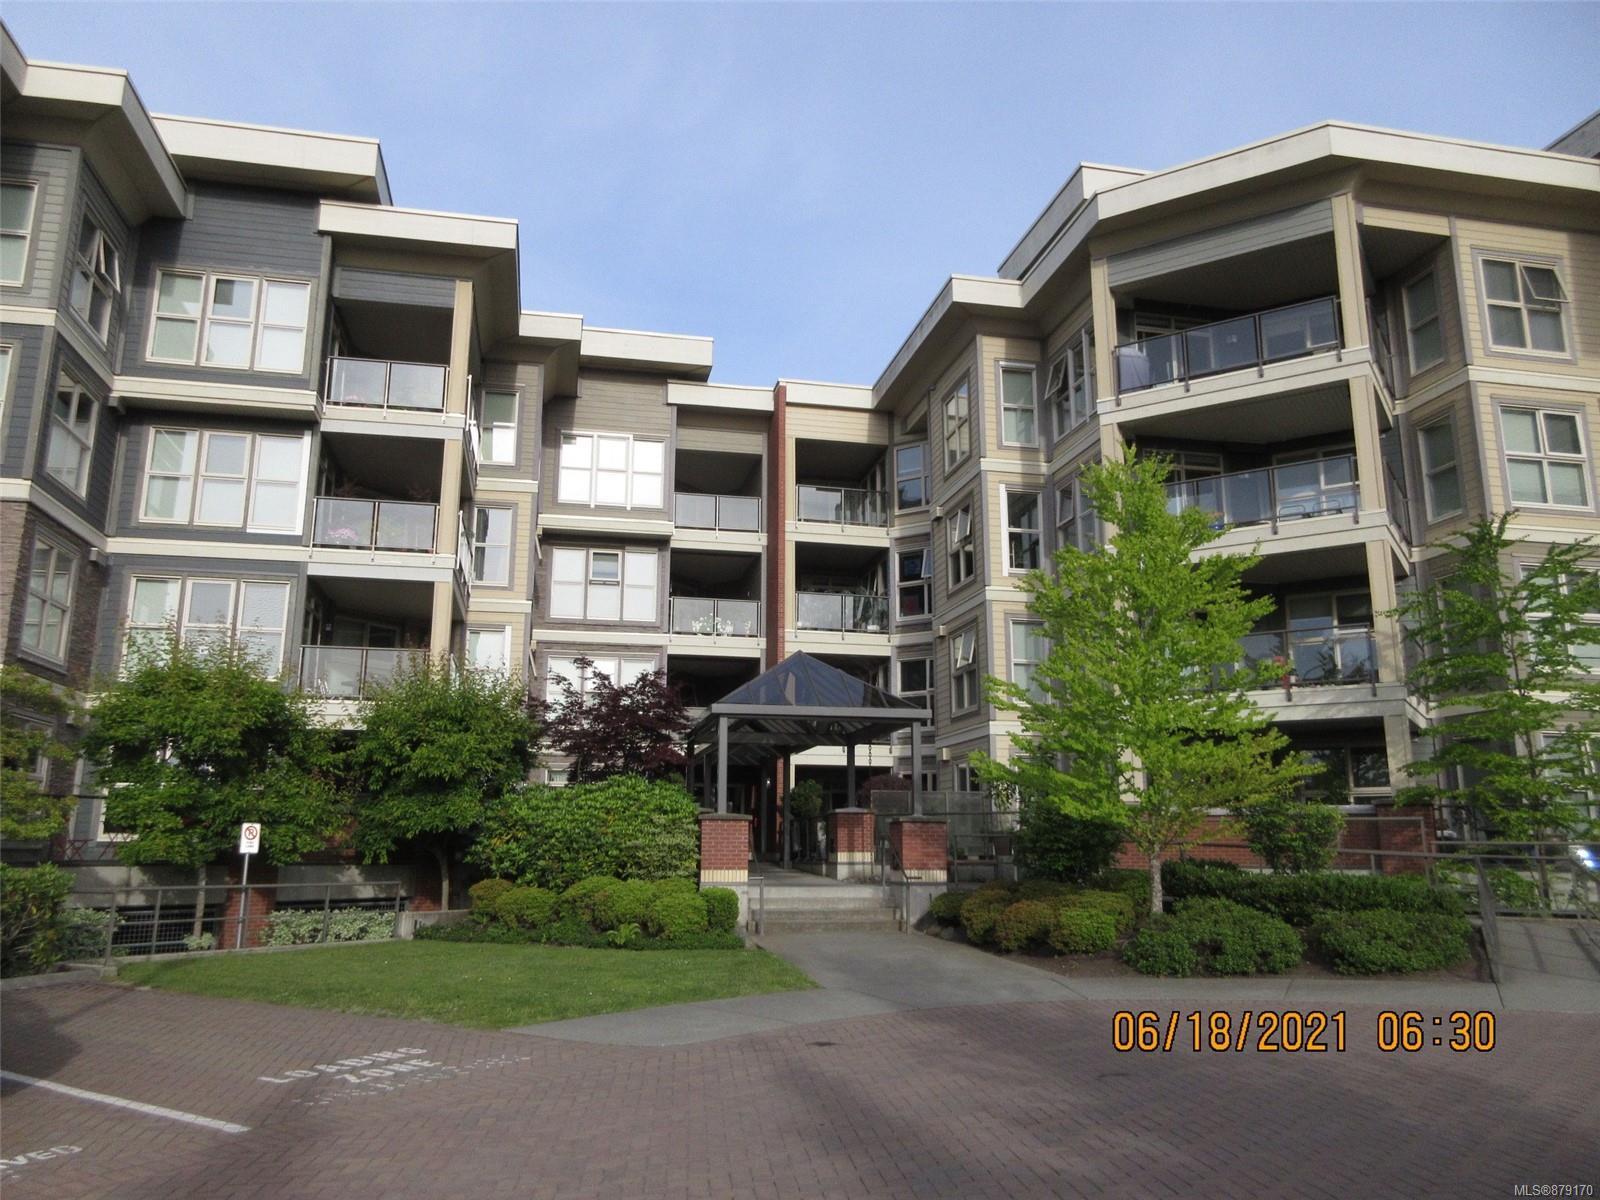 316 - 6310 Mcrobb Avenue, Nanaimo photo number 2